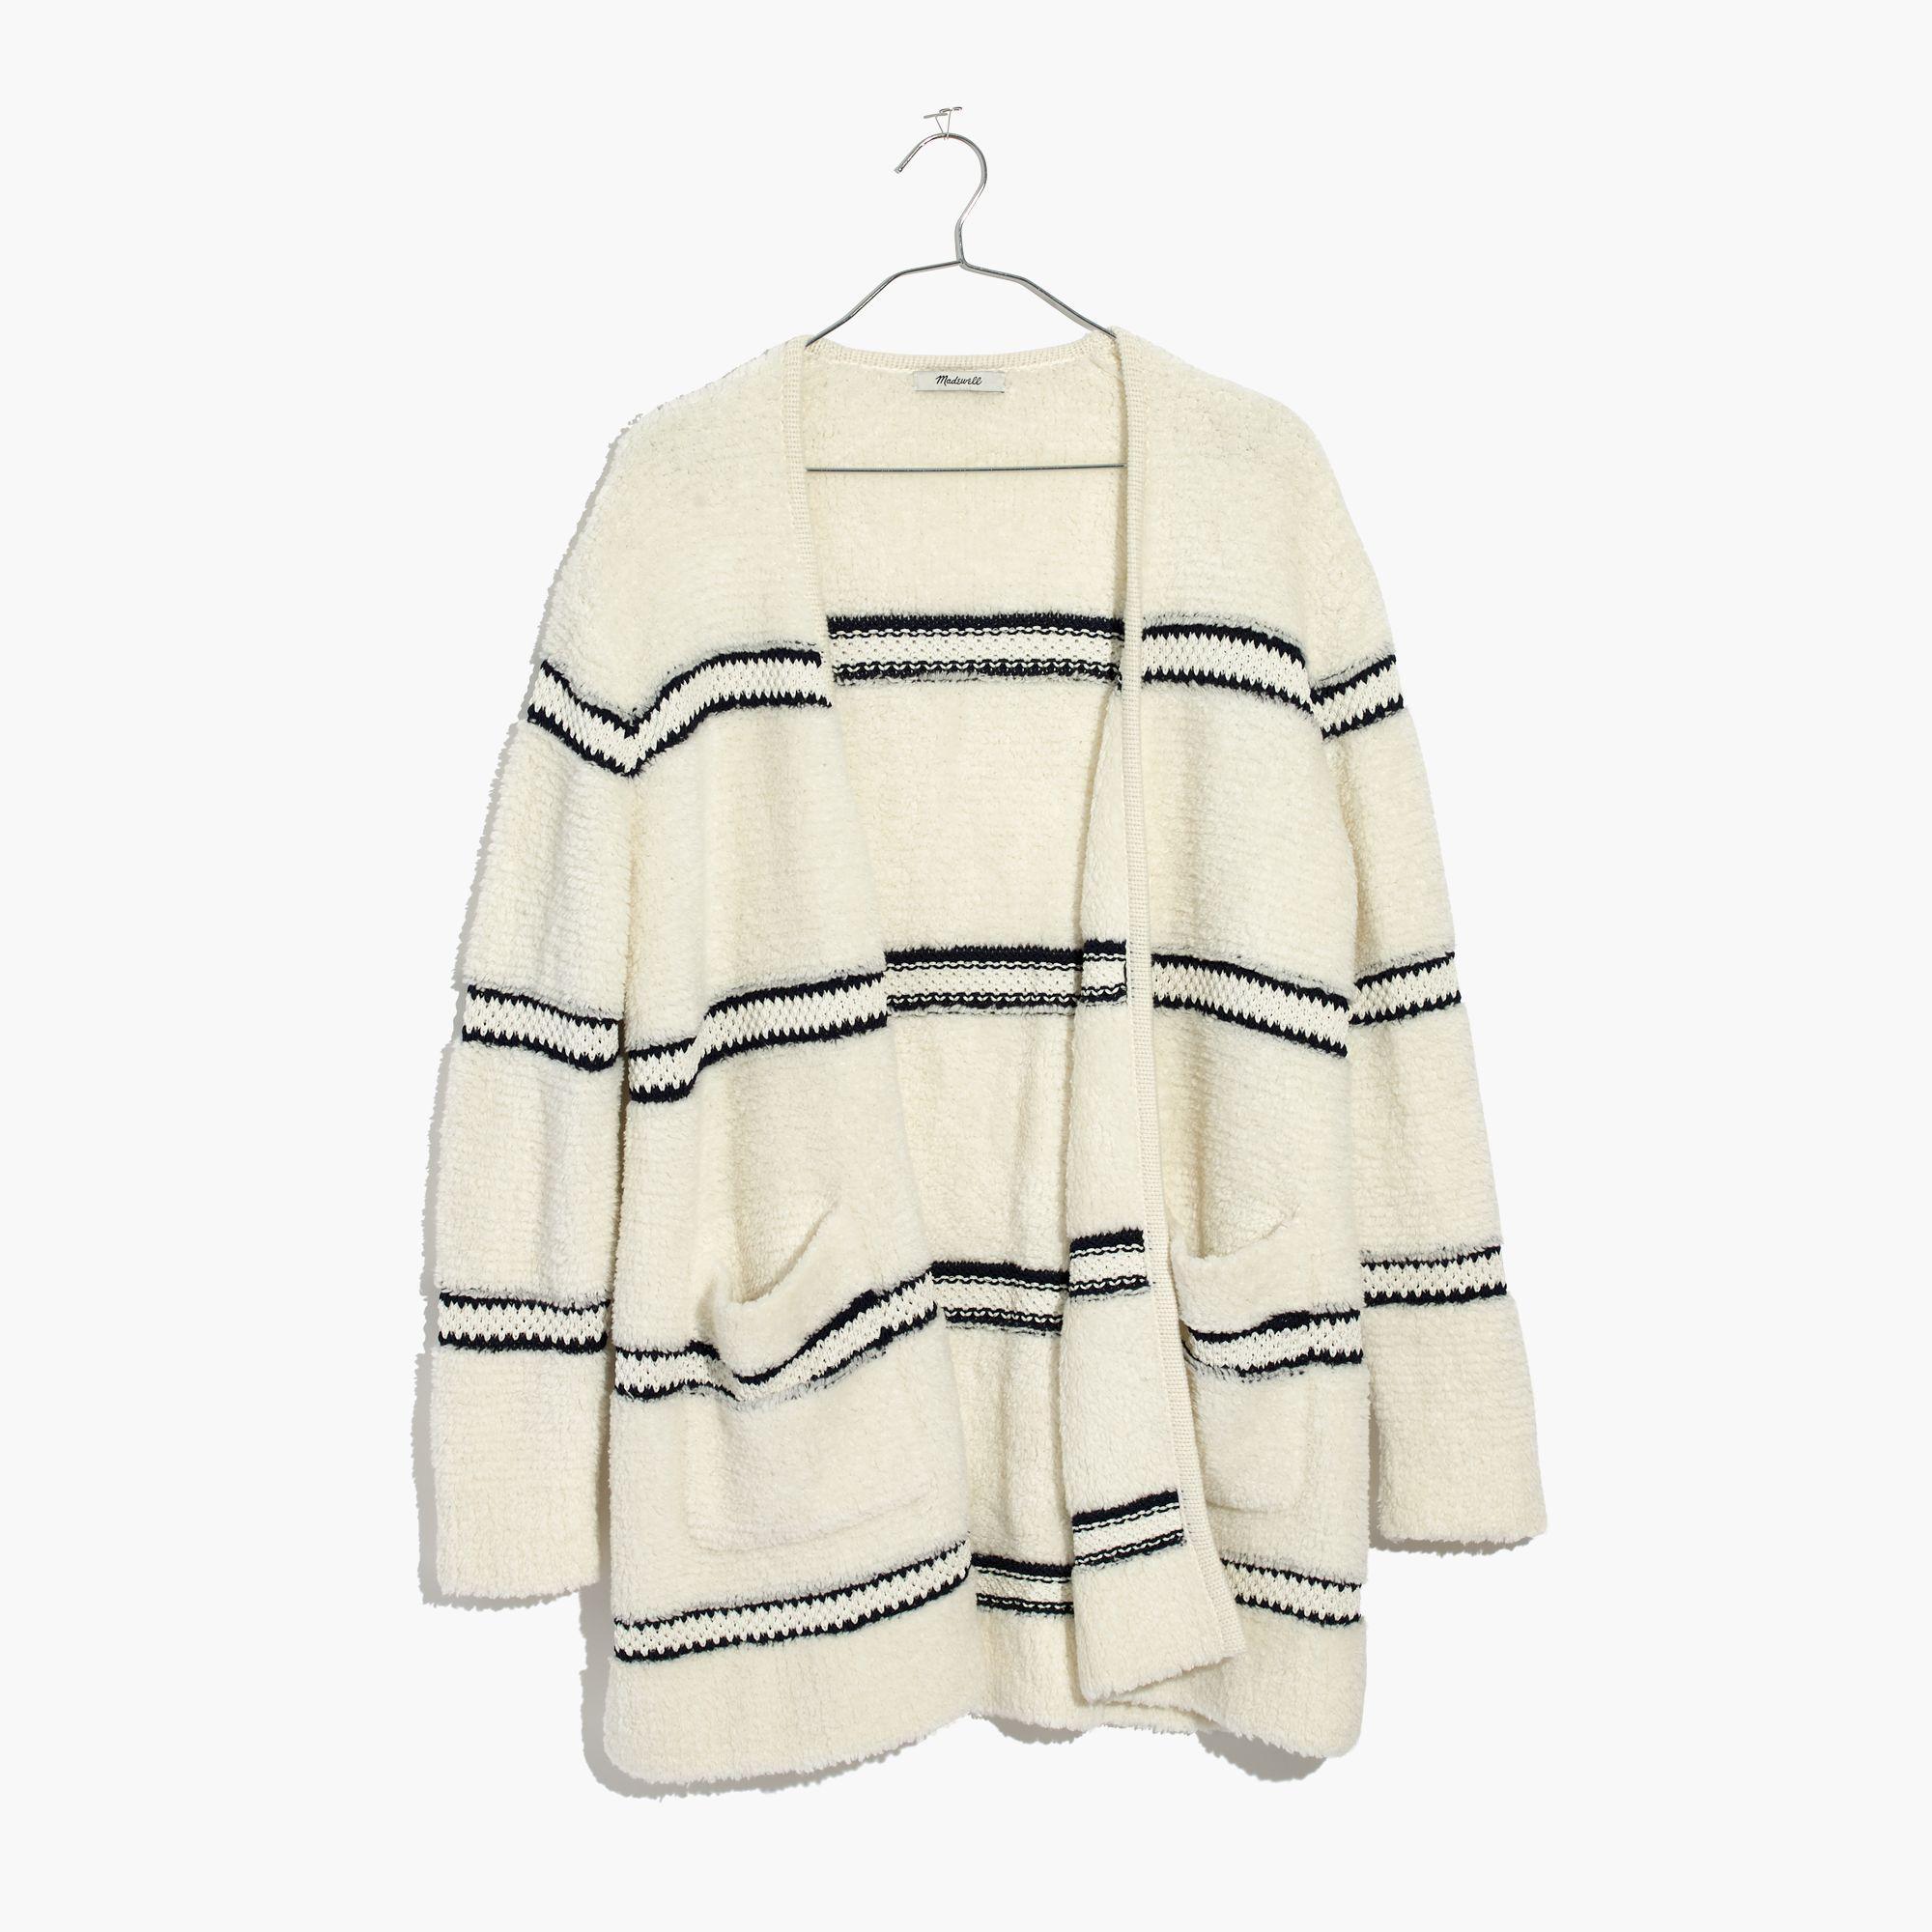 d5e57ec6c Madewell Striped Bouclé Cardigan Sweater in White - Lyst